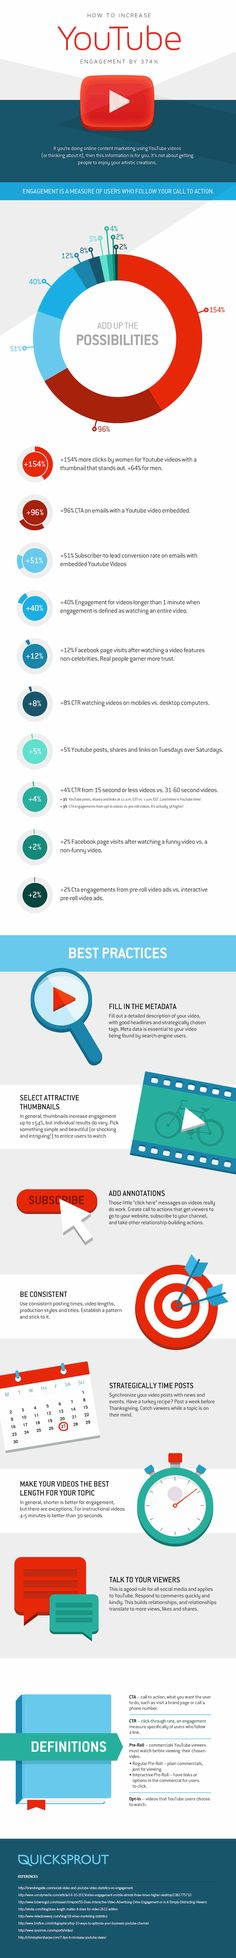 How to increase #YouTube #engagement  [#INFORGAPHIC] #SocialMediaMarketing